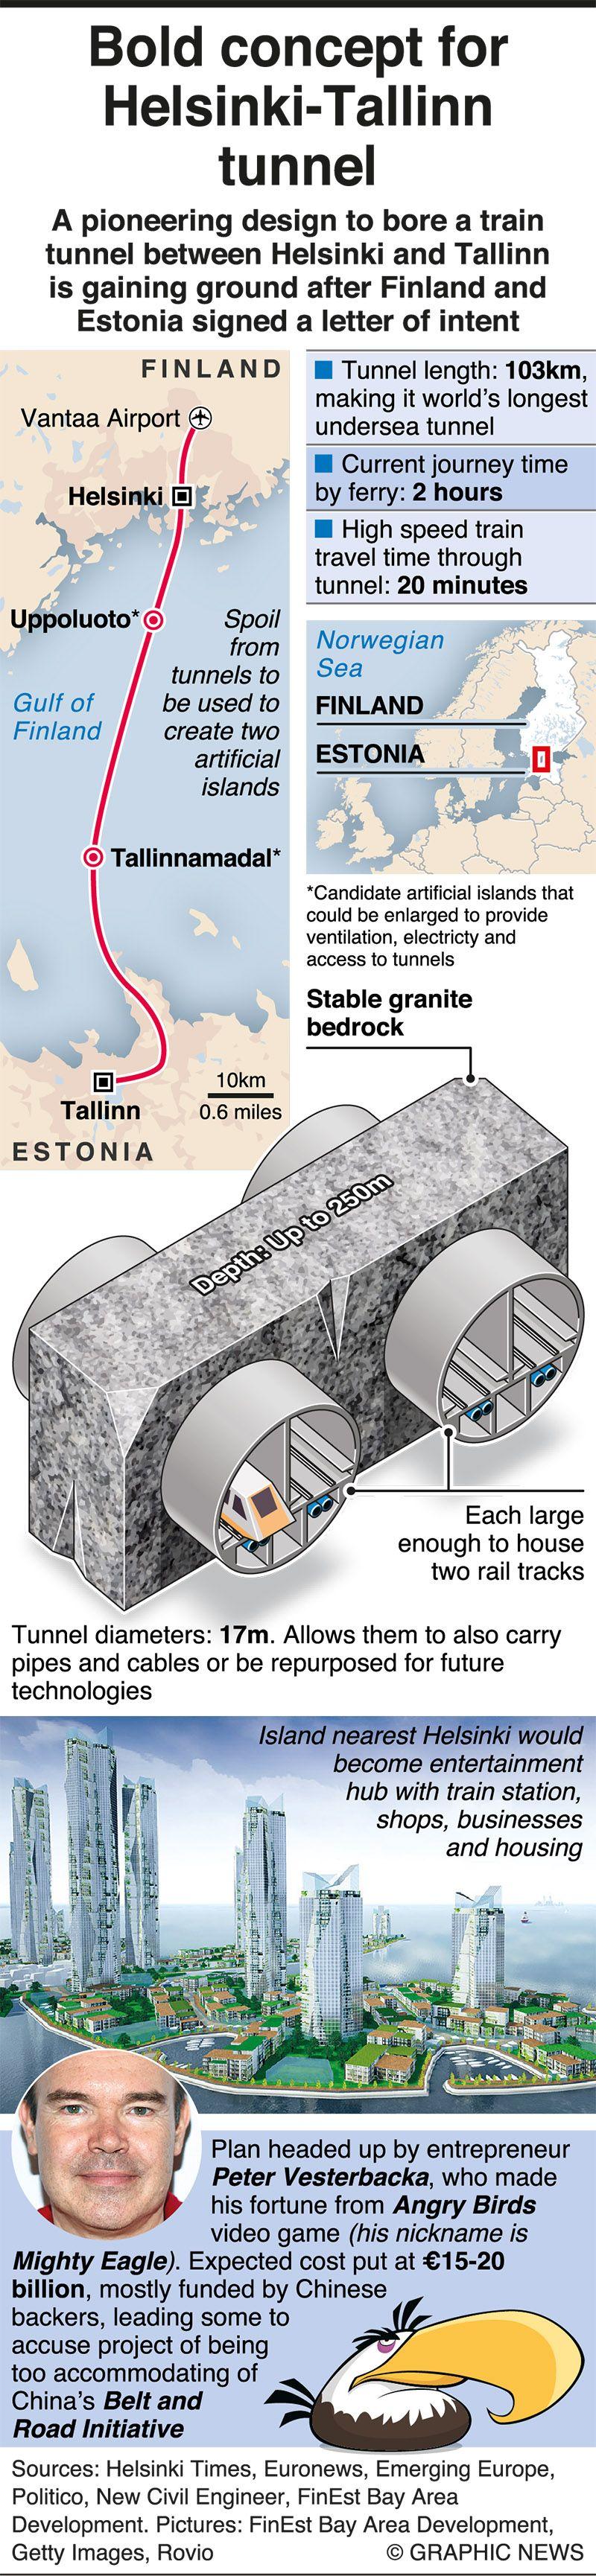 Bold concept for Helsinki-Tallinn tunnel